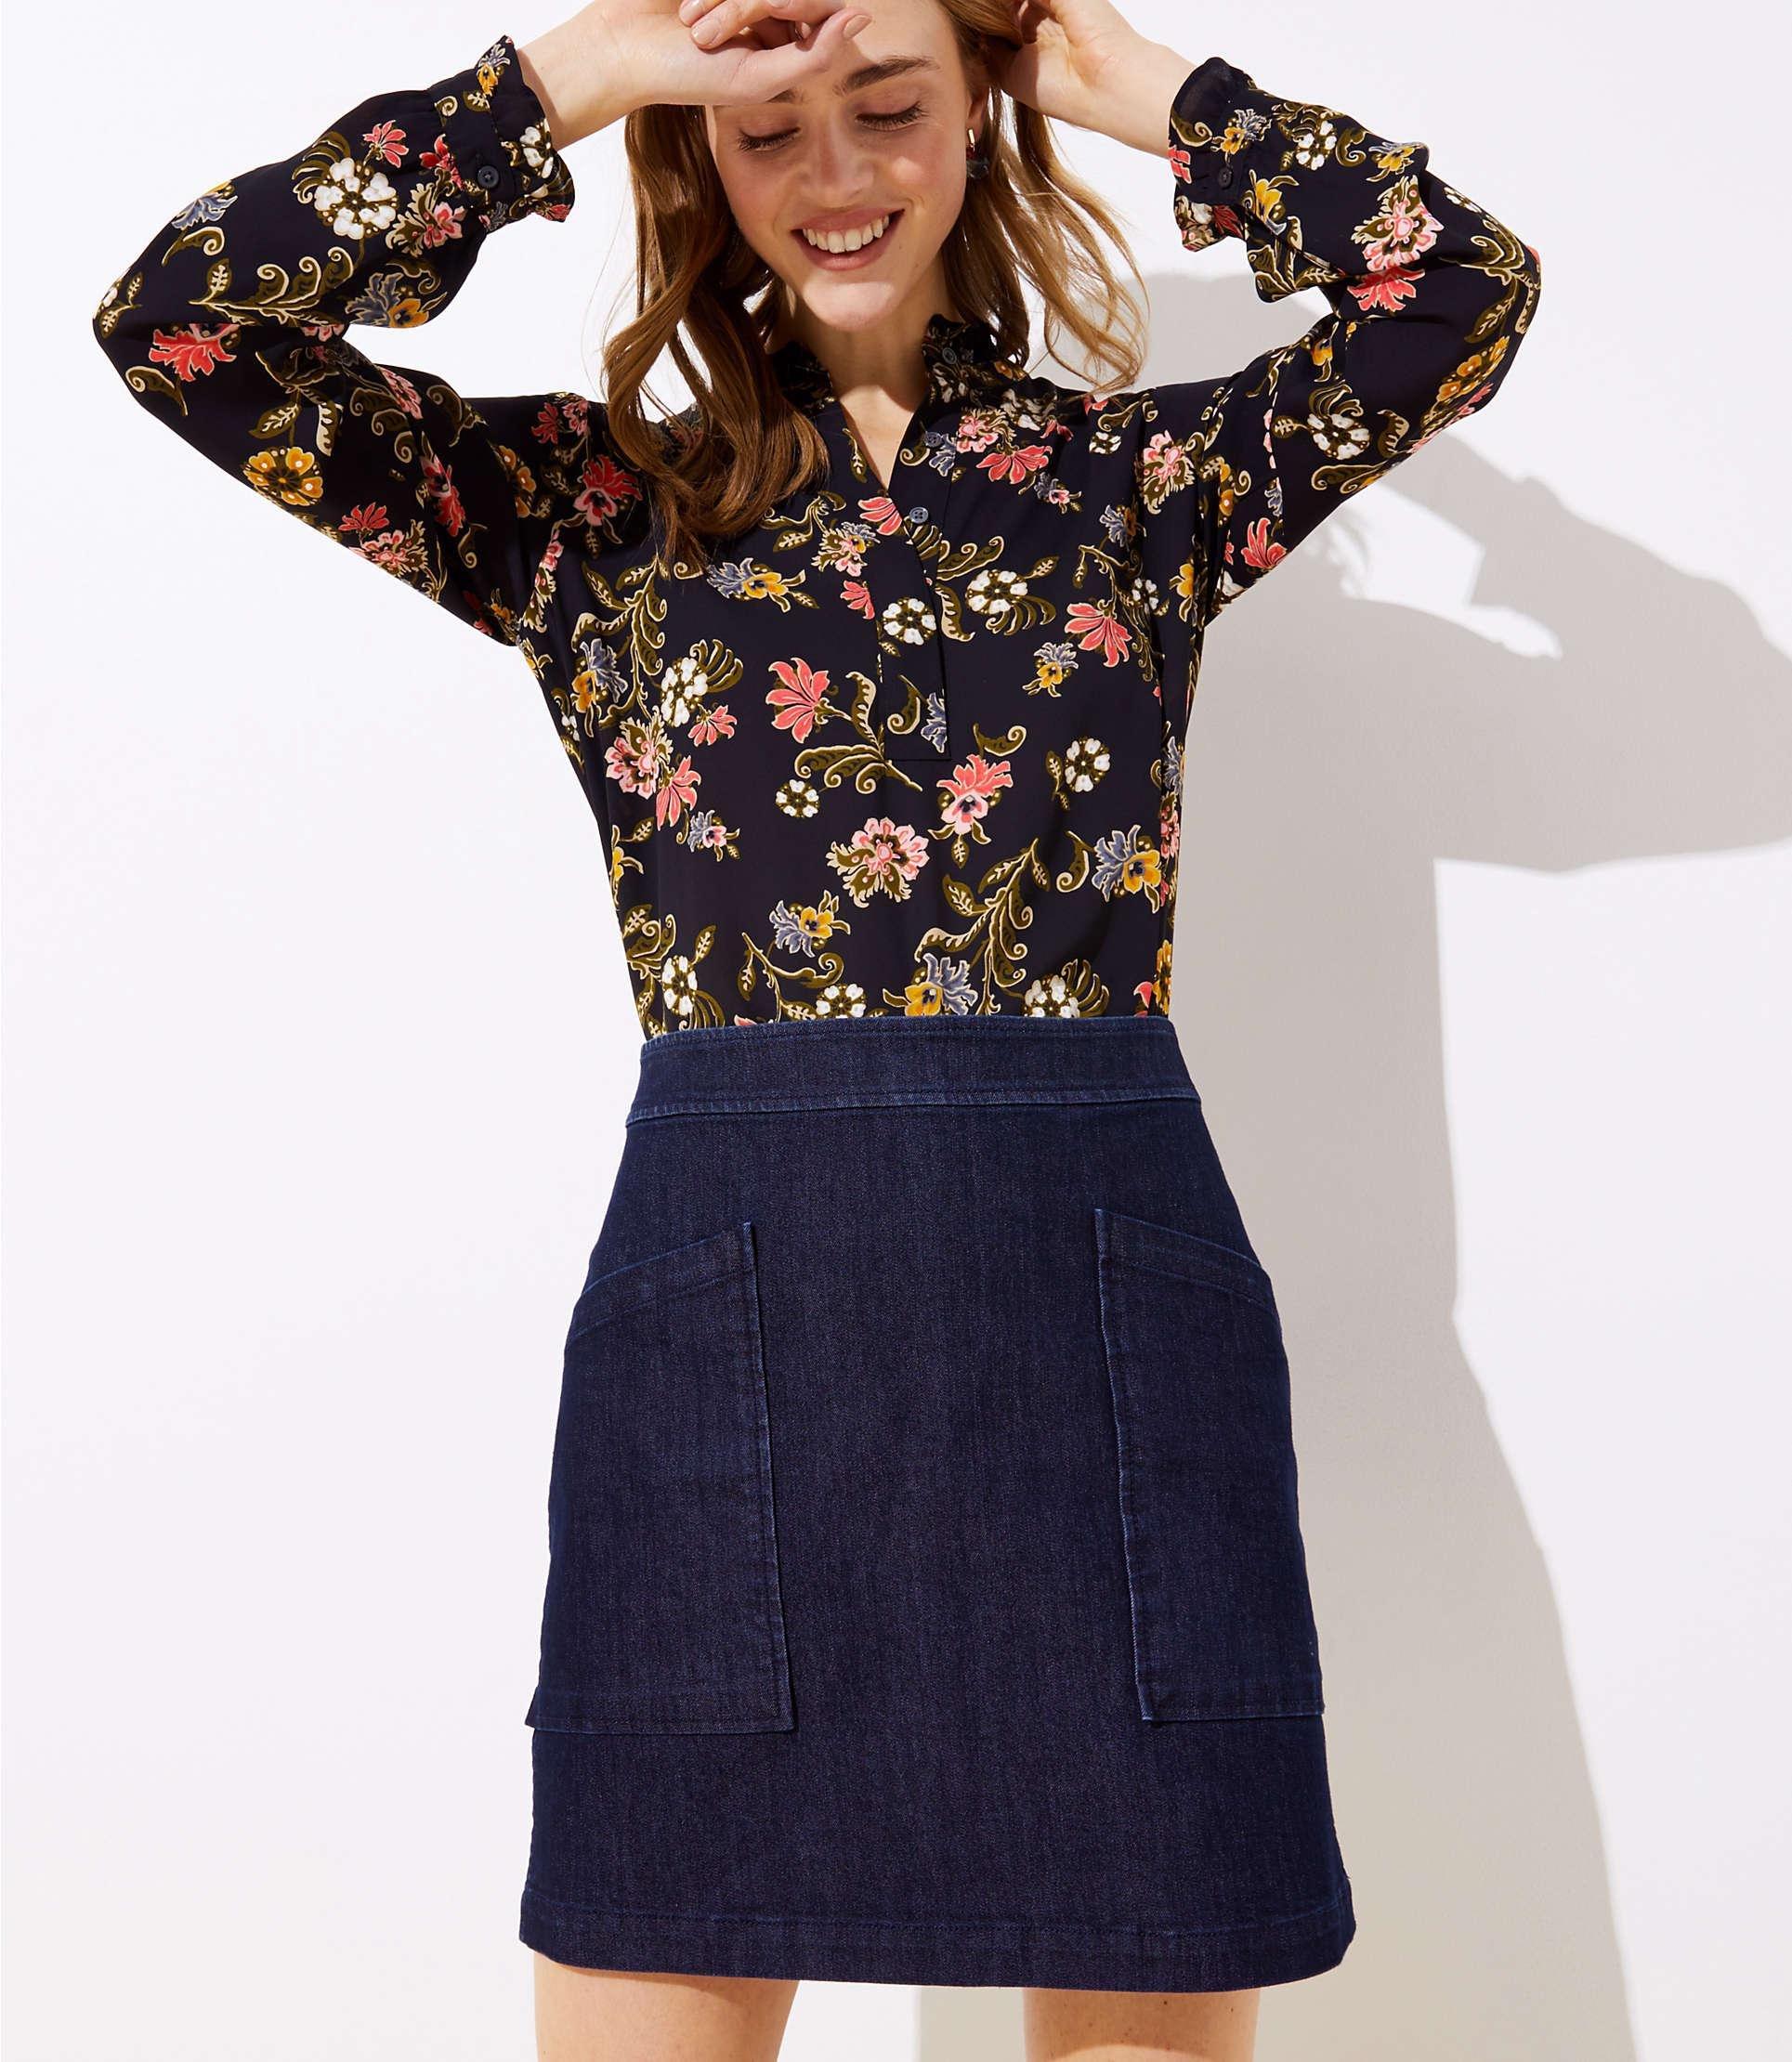 fcce2b63b Lyst - LOFT Denim Pocket Shift Skirt in Blue